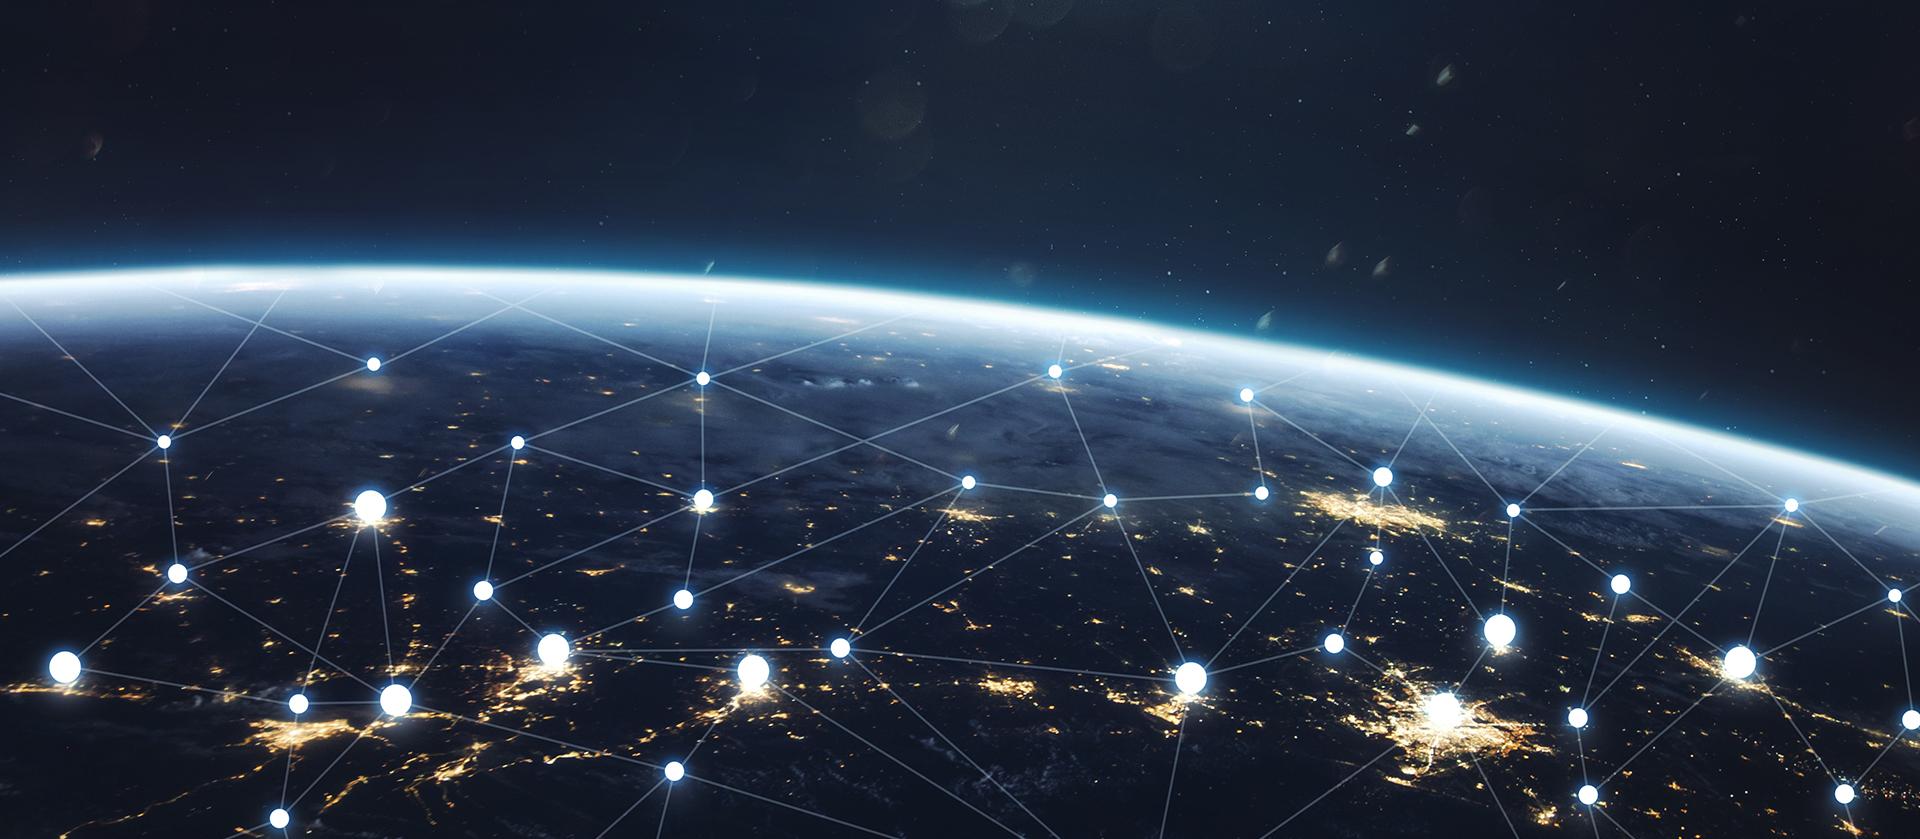 Transatlantic Cyber Security Business Network